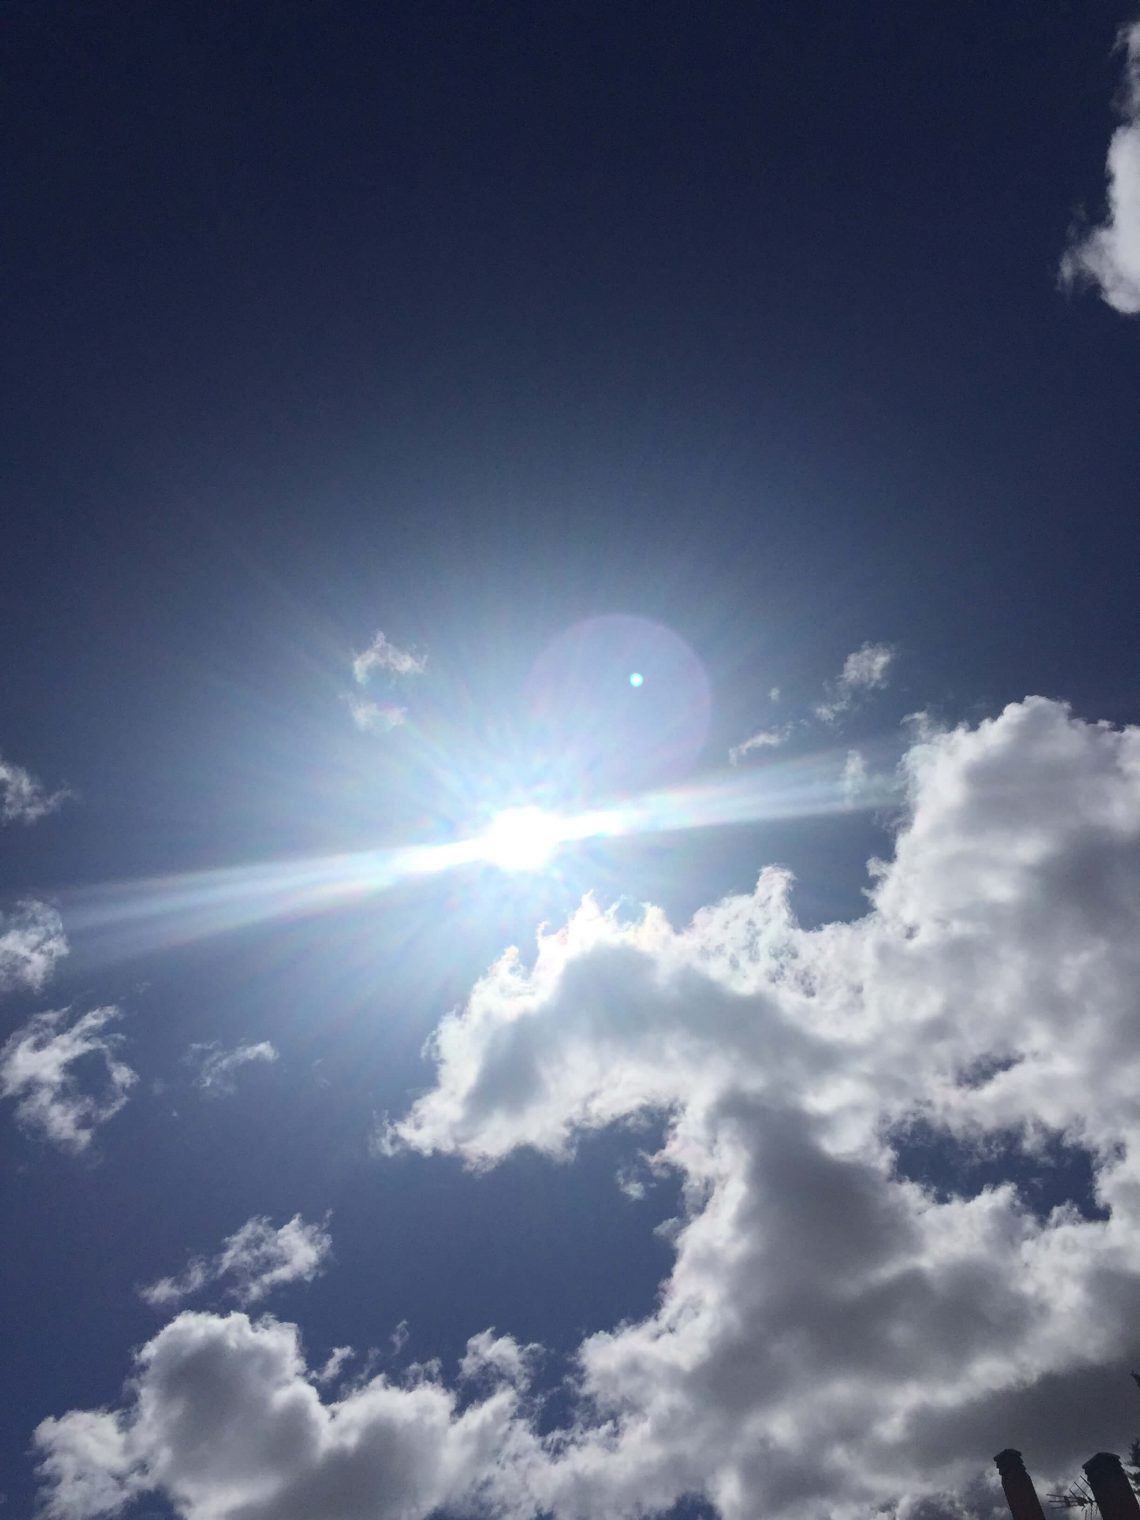 Sol entre nubes. Duendecillo Verde